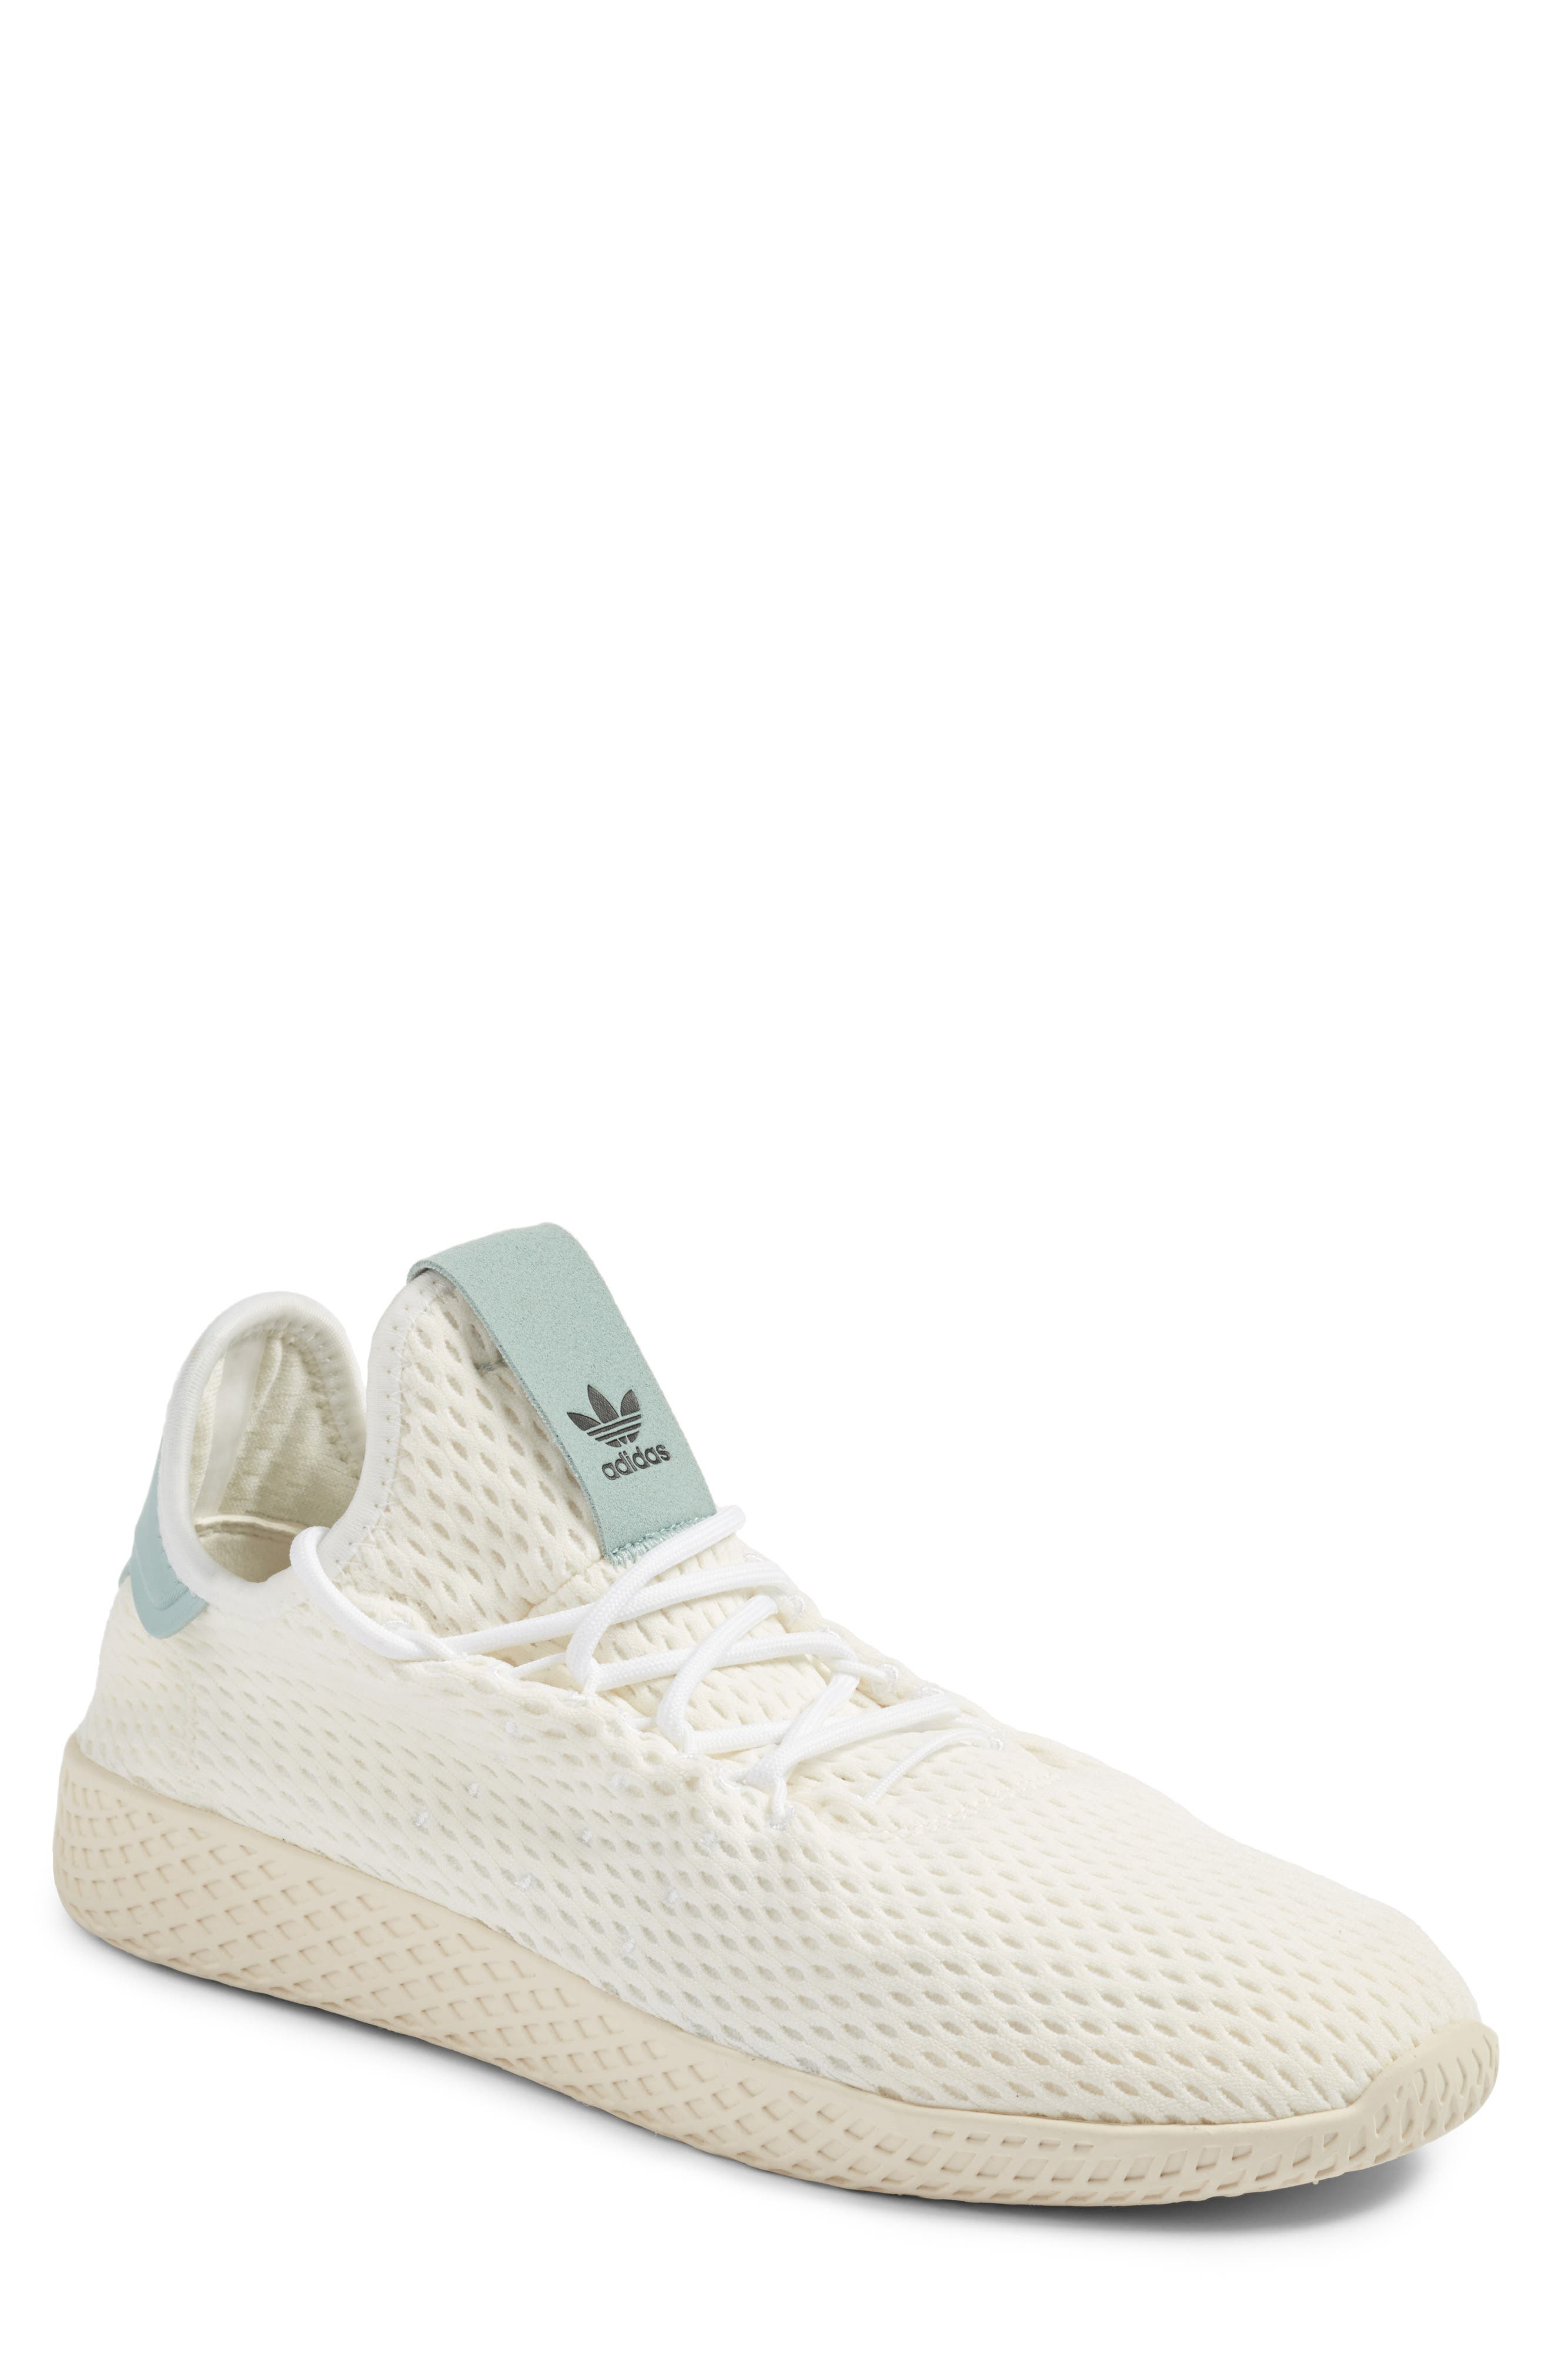 Main Image - adidas Originals x Pharrell Williams Mesh Sneaker (Men)